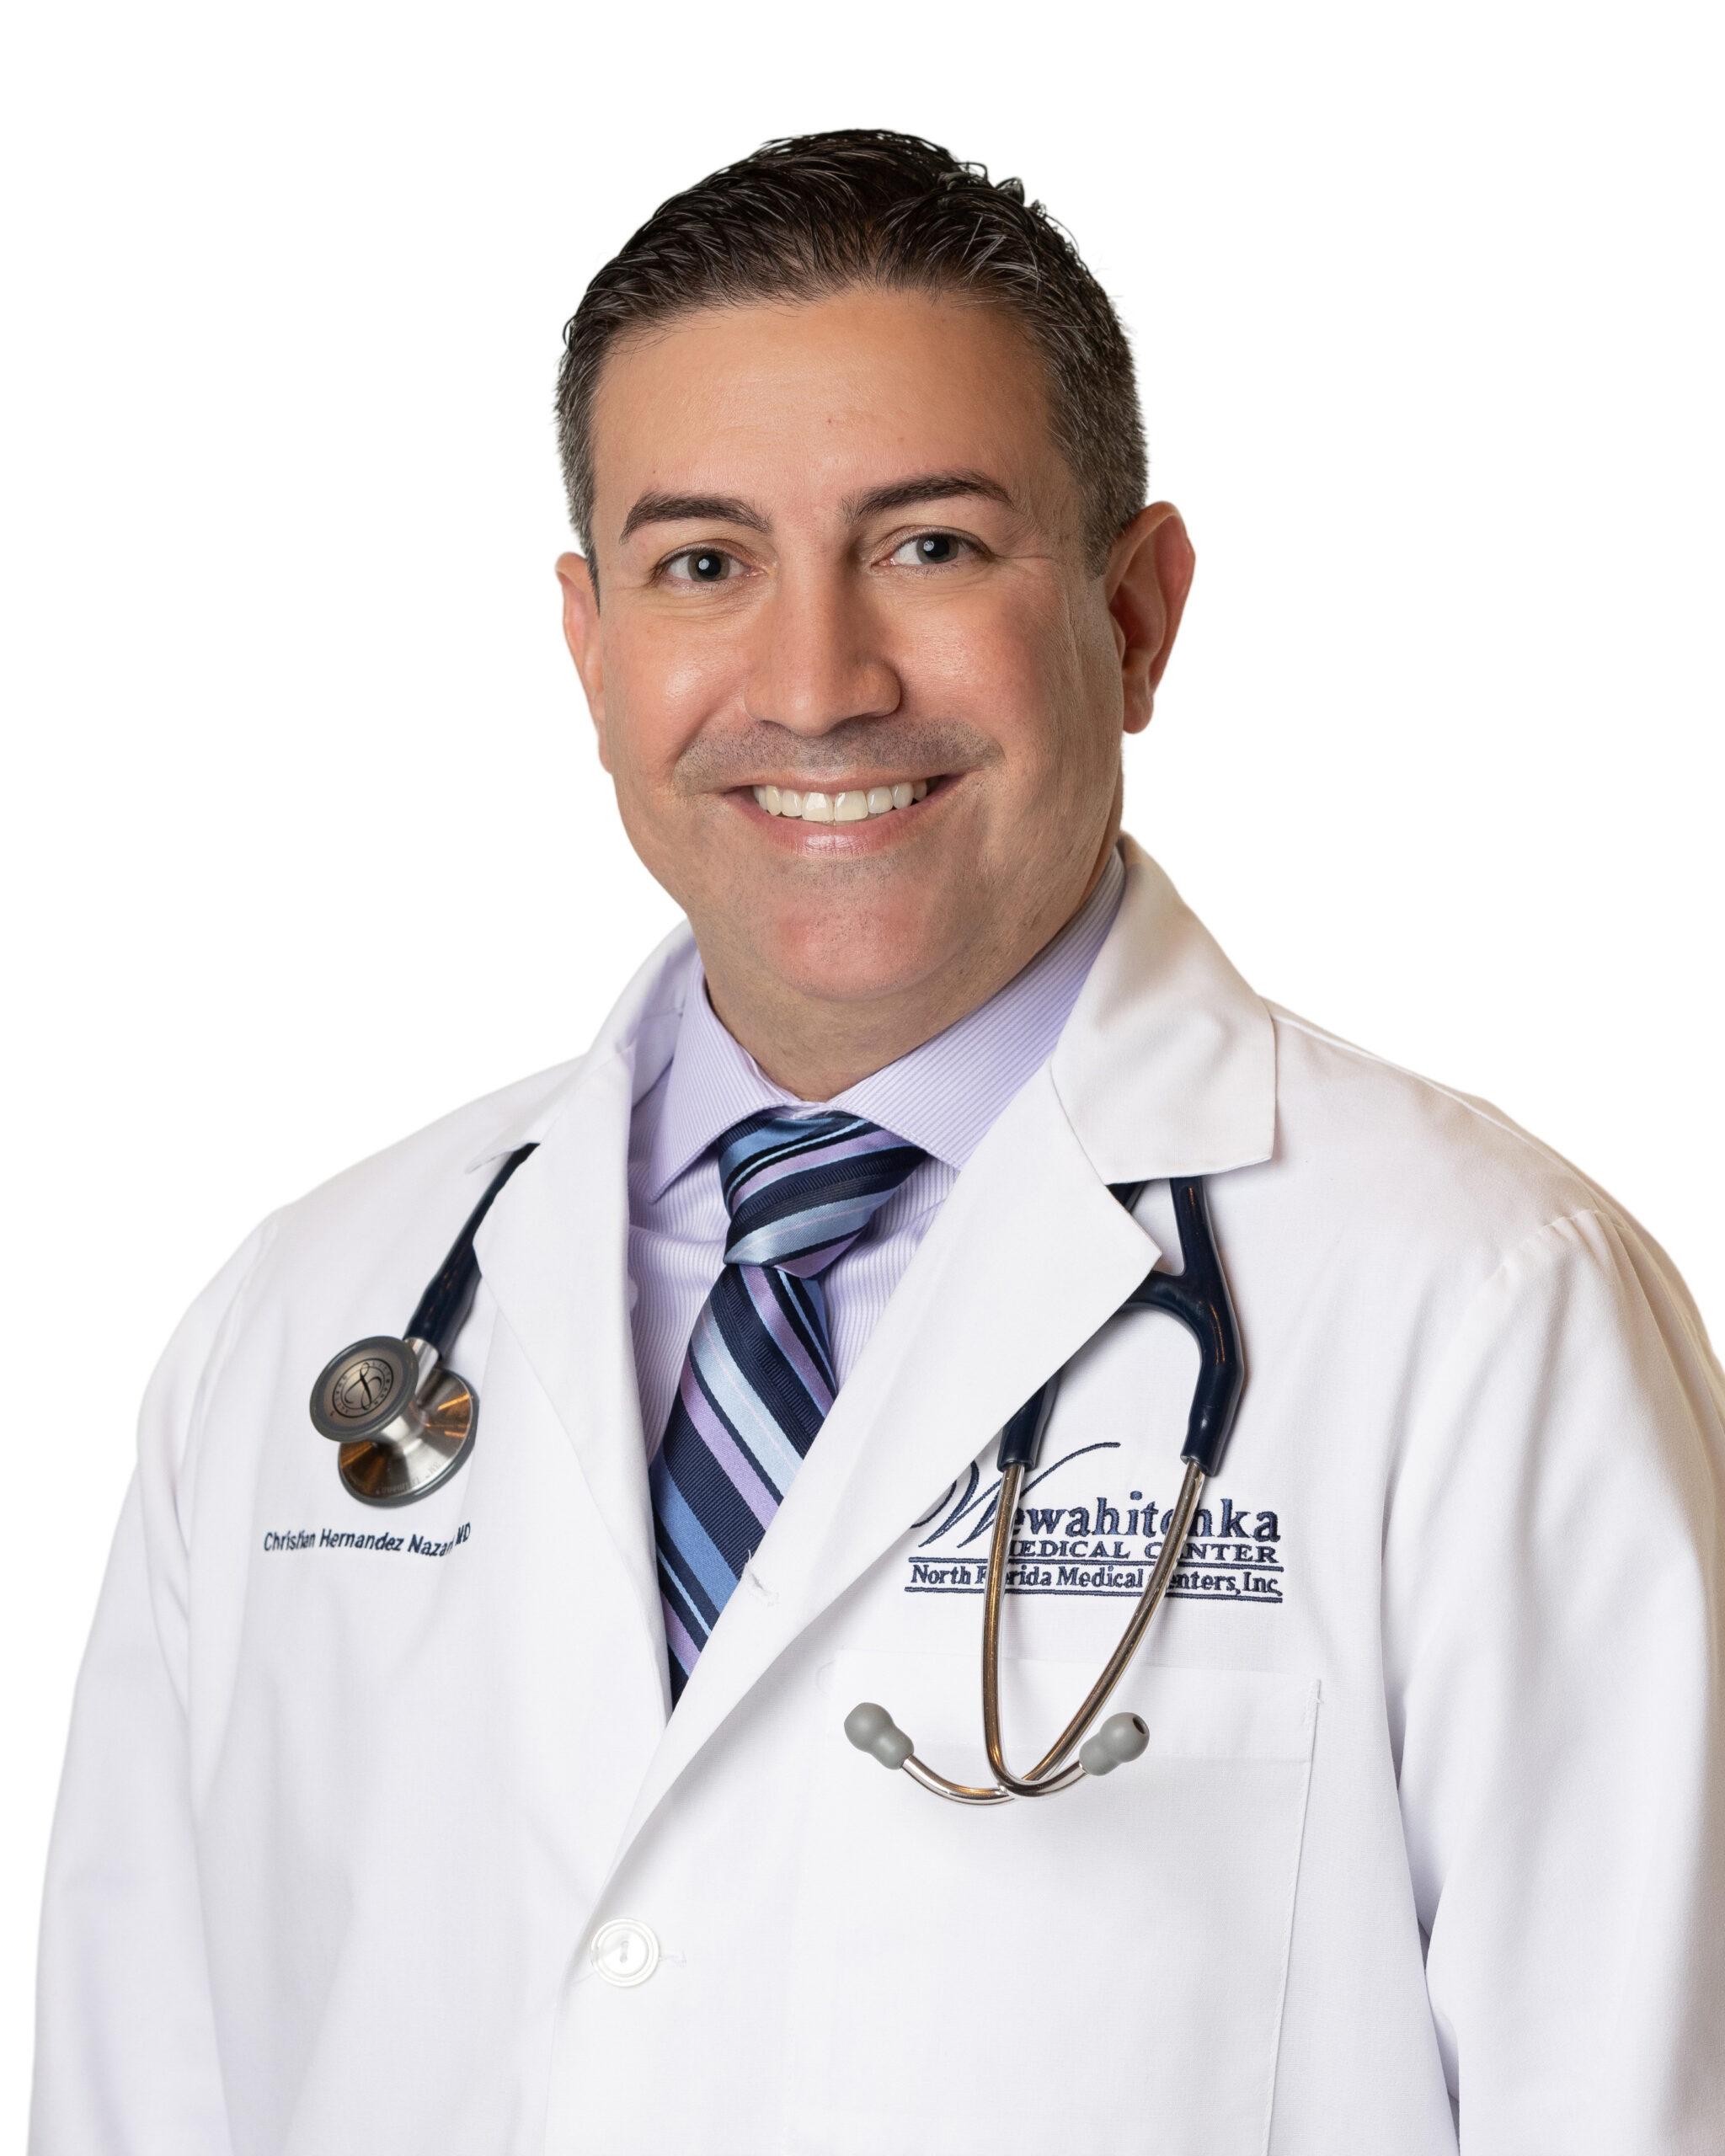 Dr. Christian Hernandez